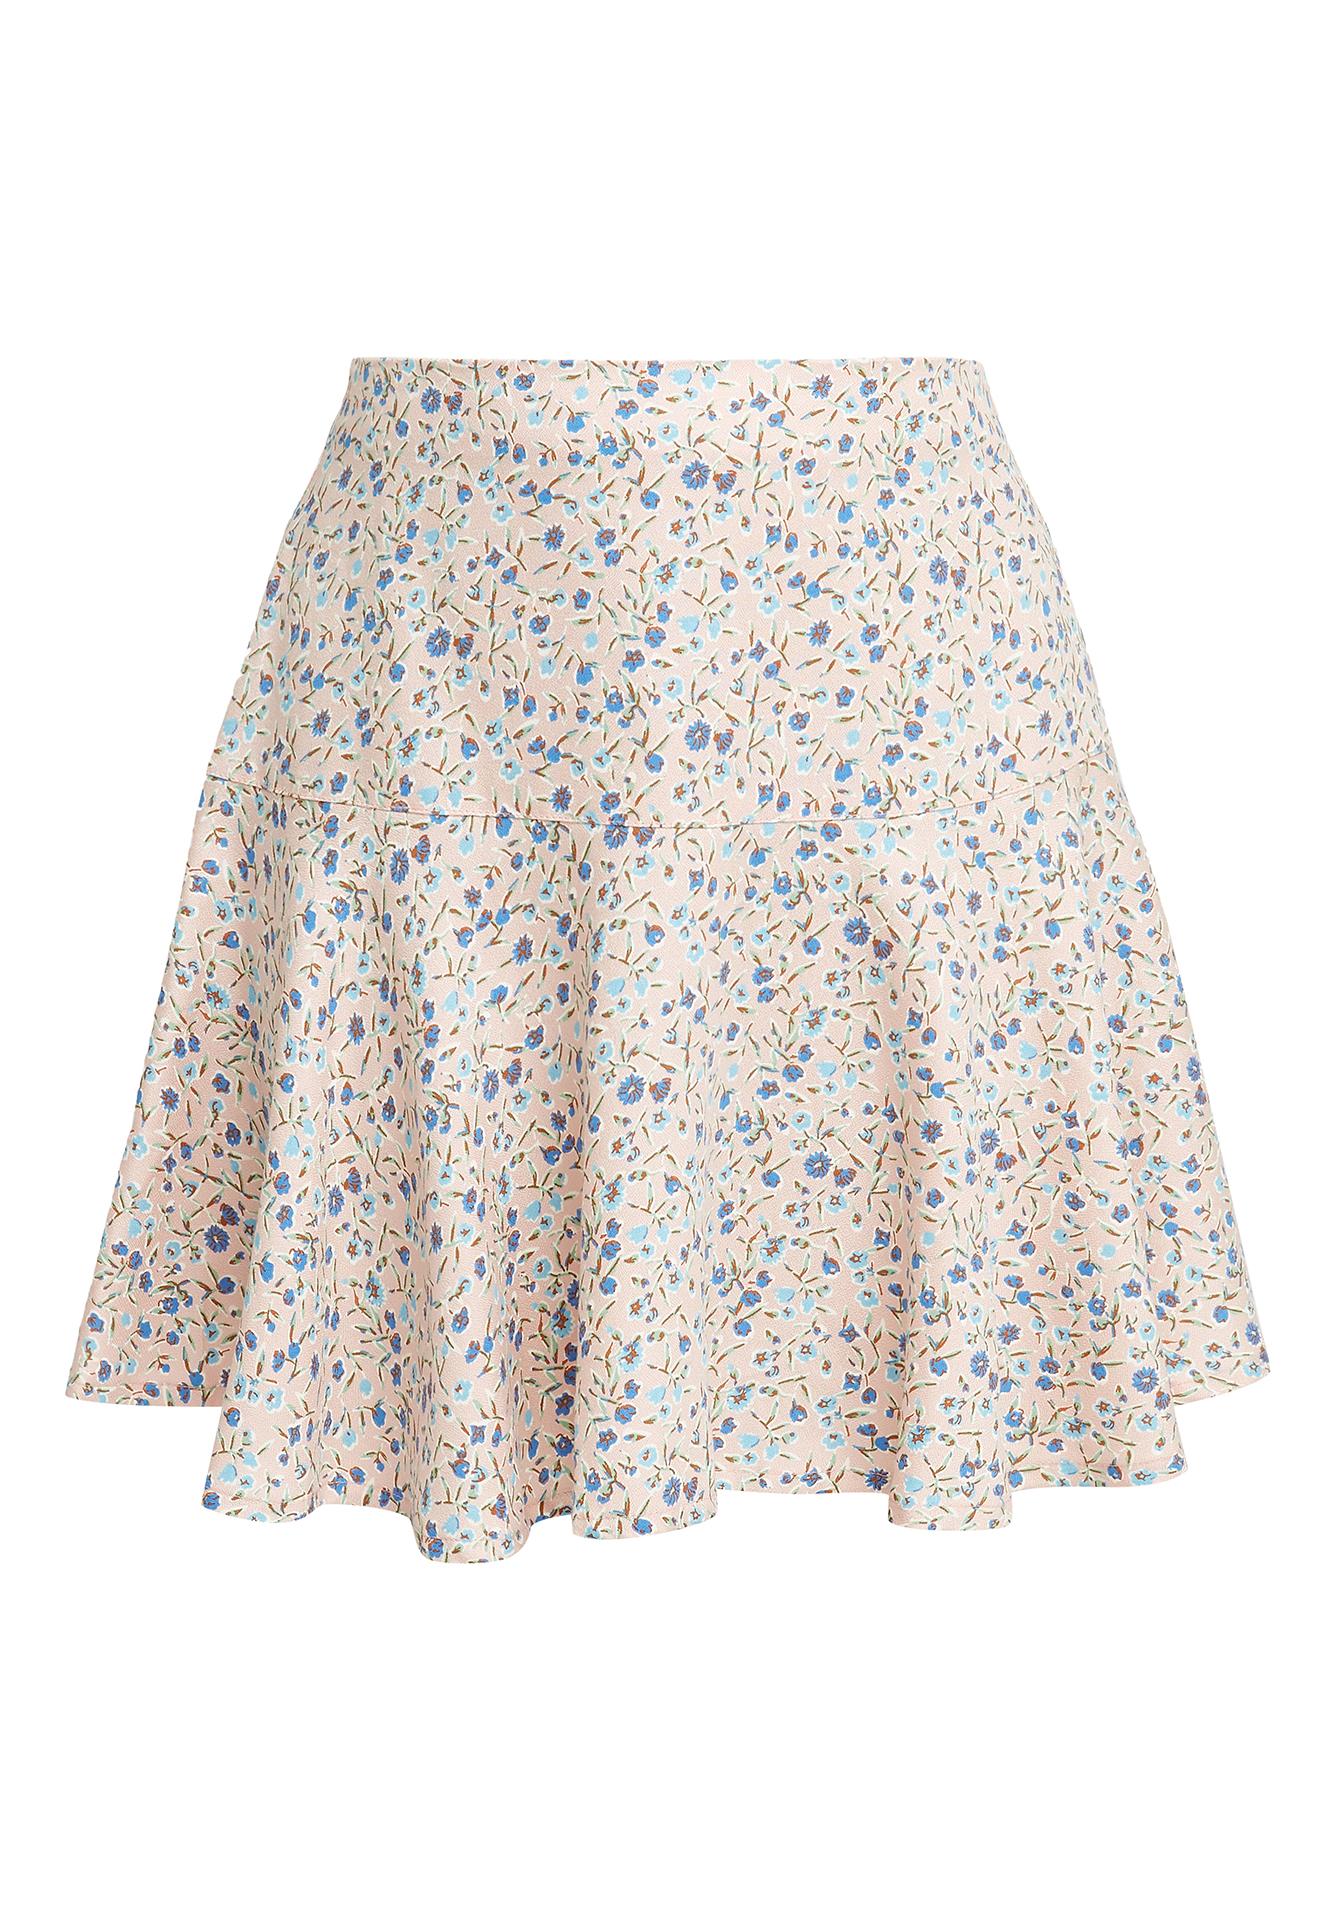 Olivia Meadow Skirt